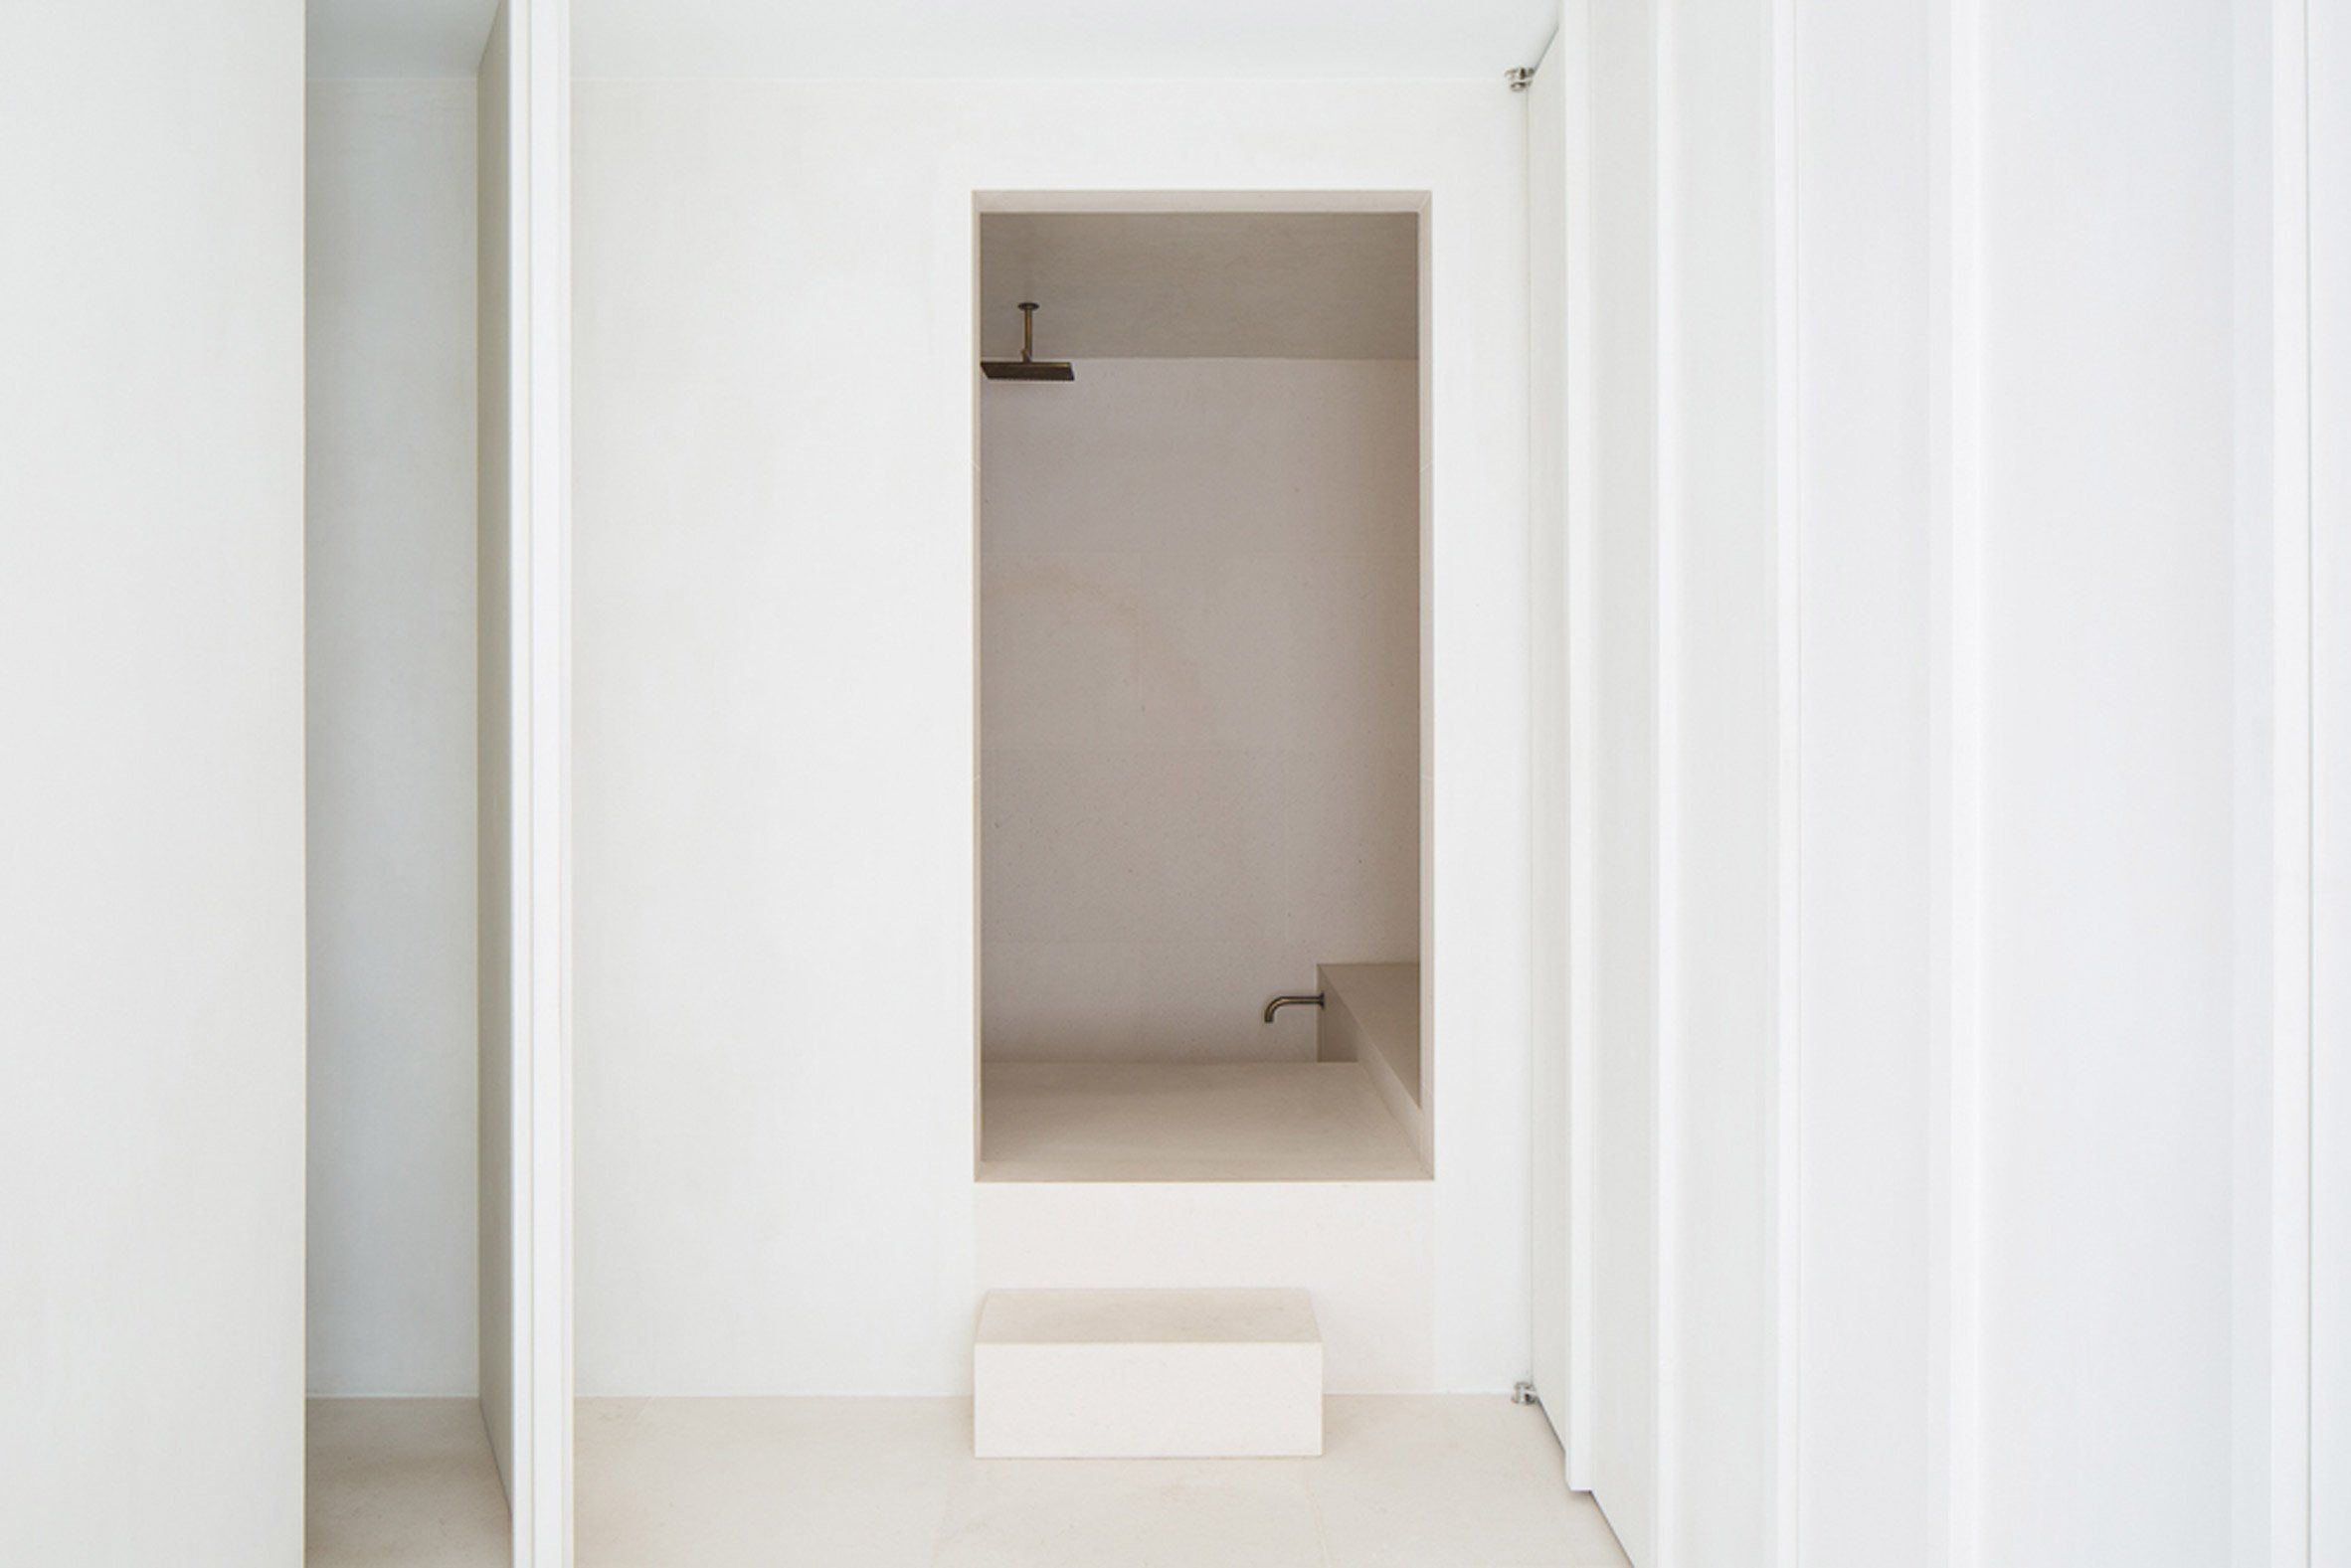 Penthouse brtiselei by hans verstuyft architecten belgian